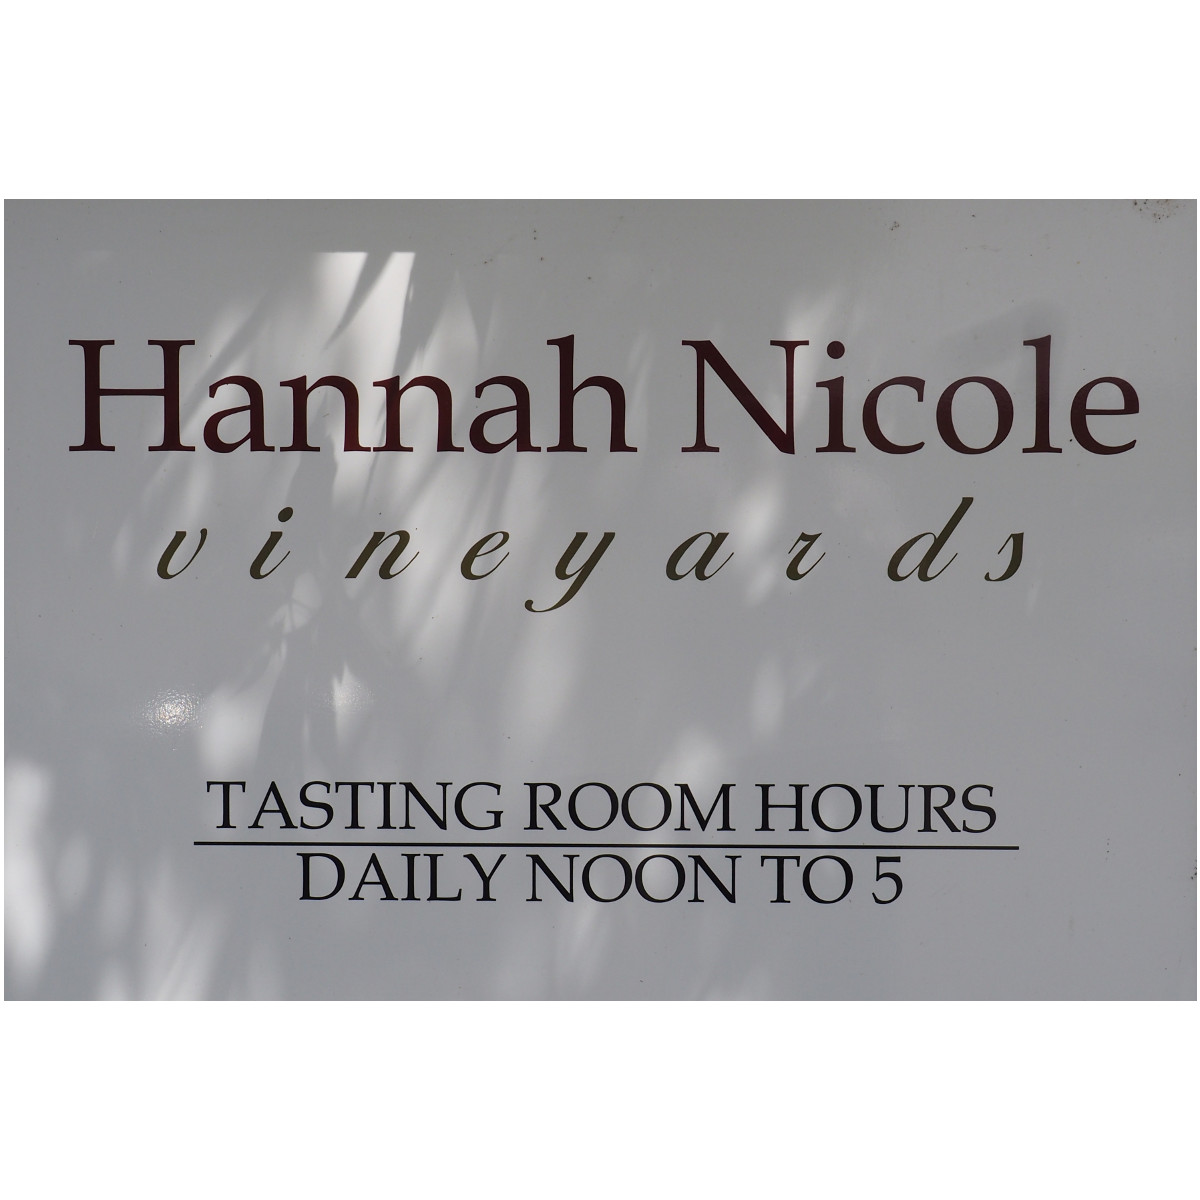 Hannah Nicole Winery